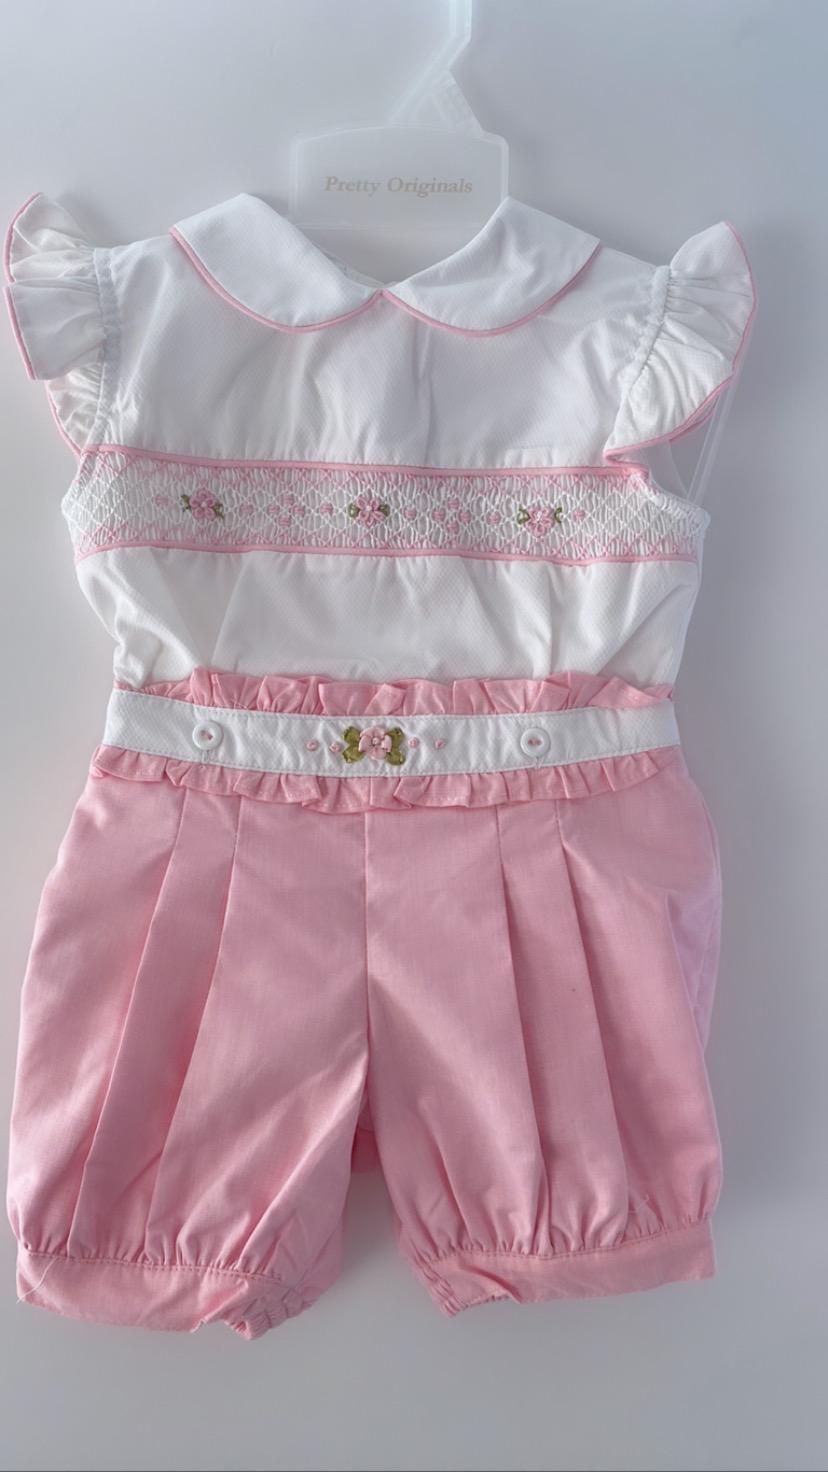 Pretty Originals Smocked Pink Playsuit